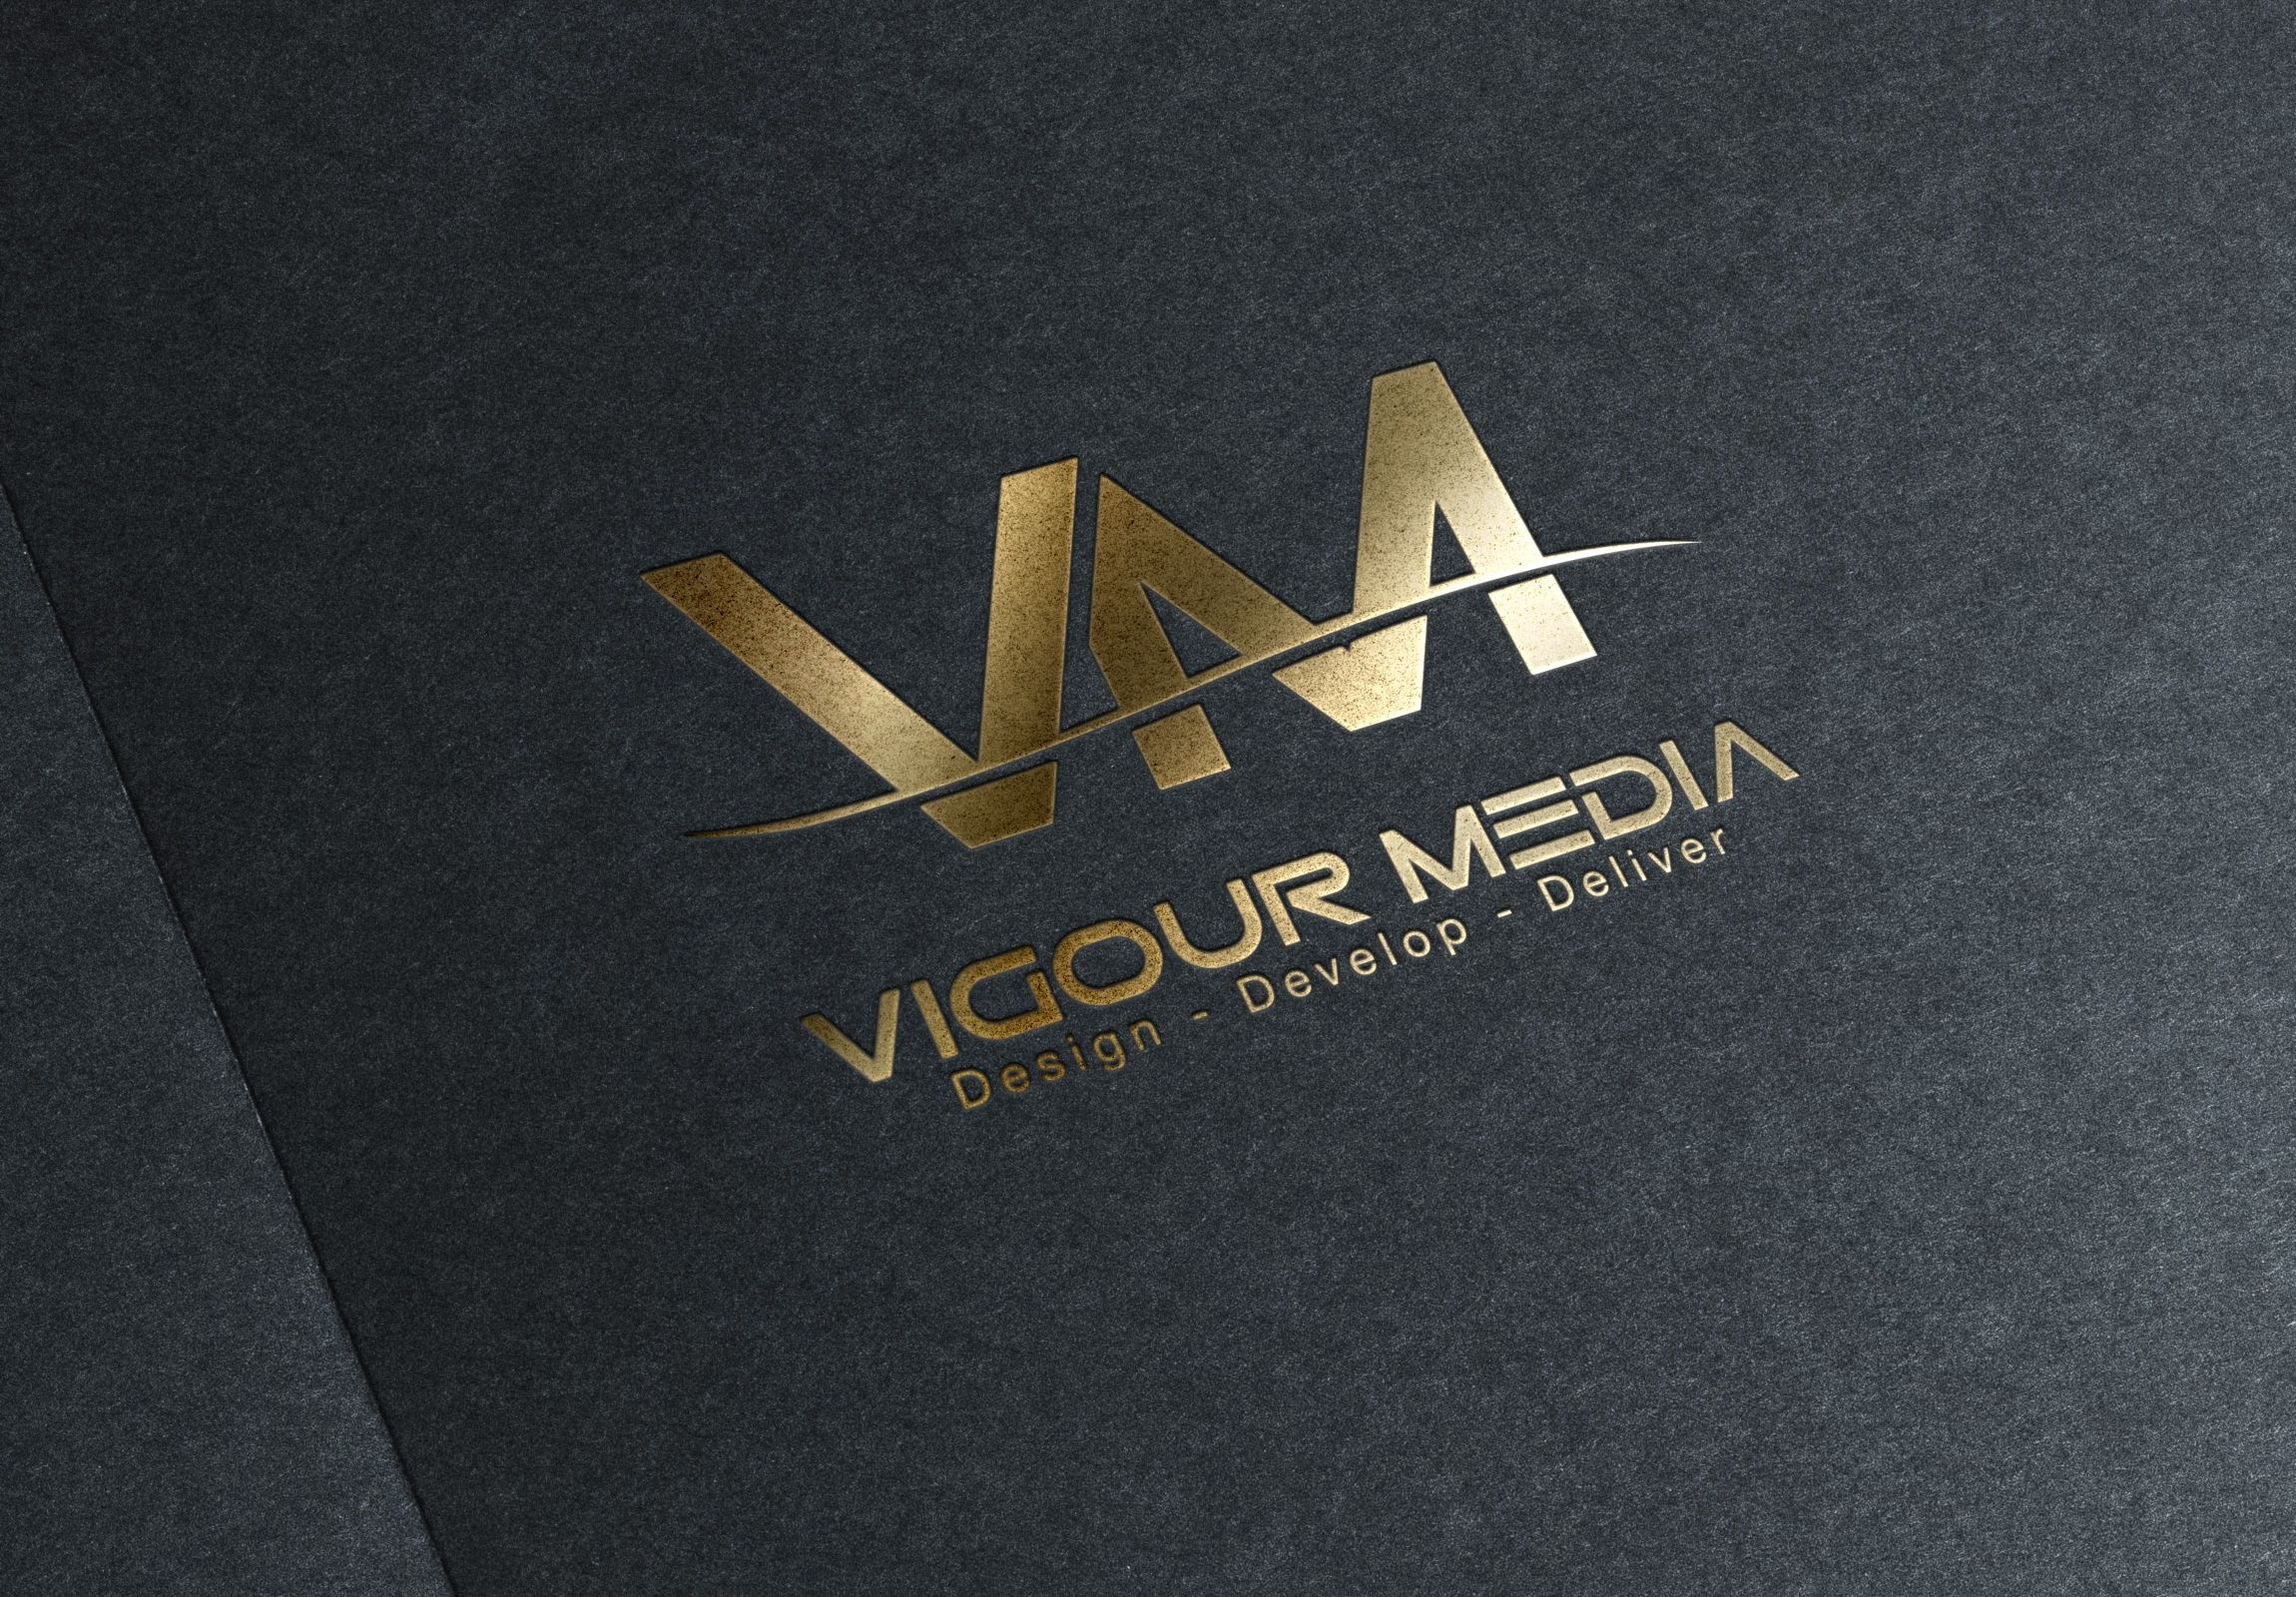 Loghi Mobili ~ Client name : vigour media develop websites mobile applications